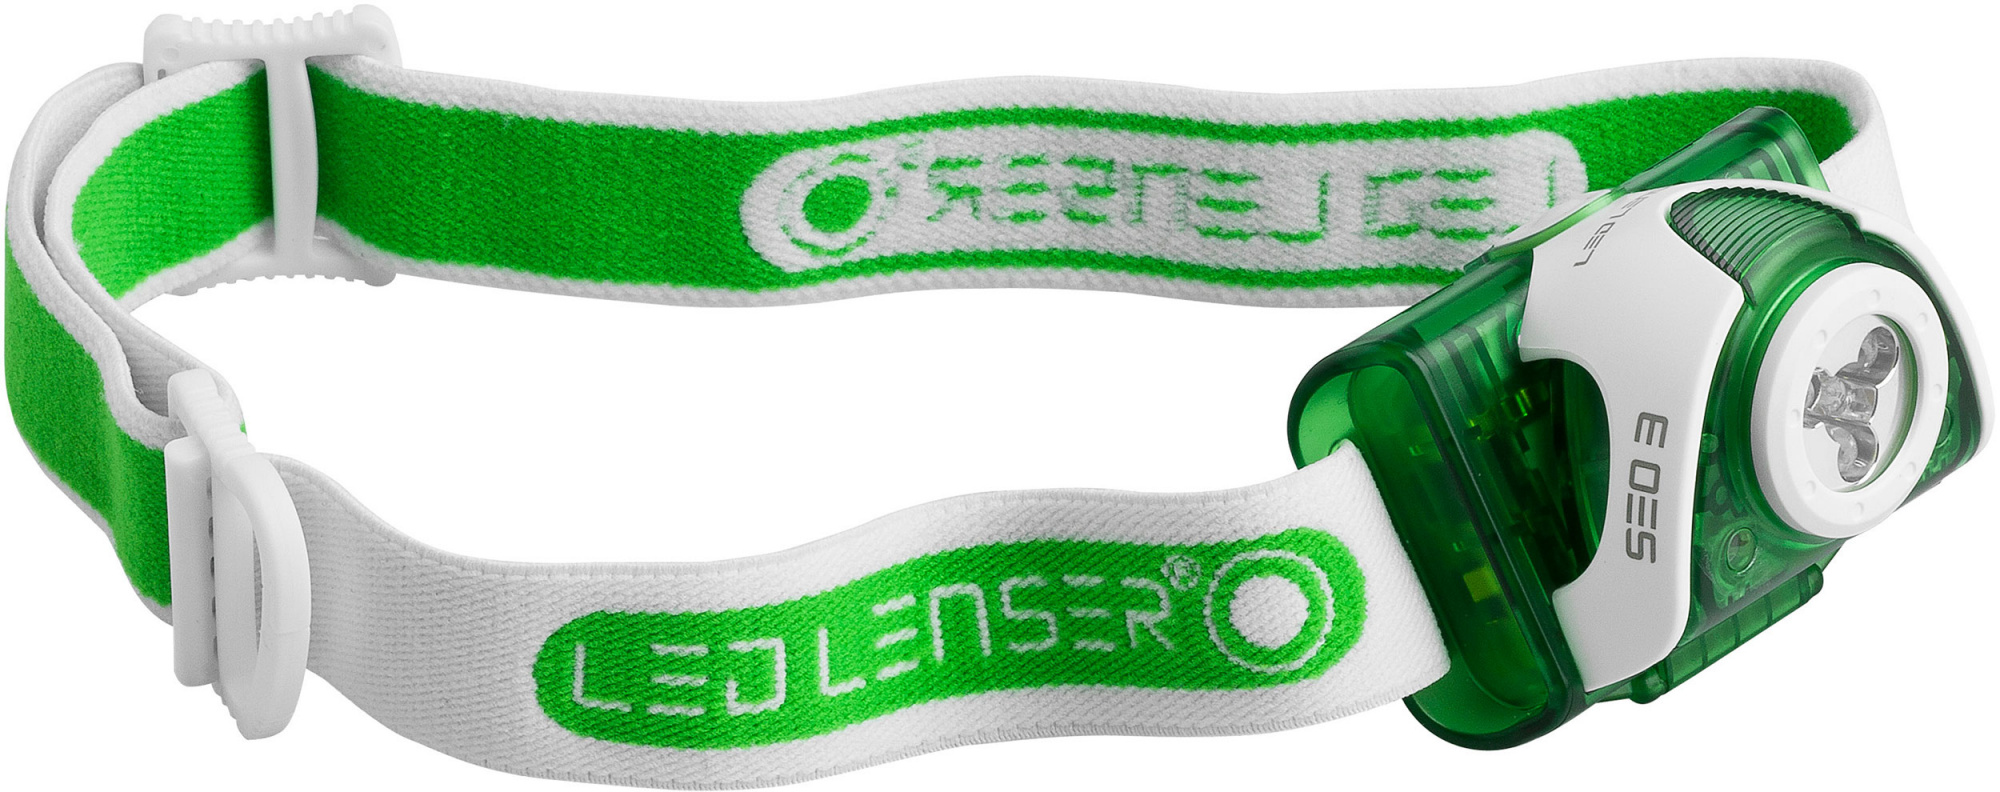 Led Lenser Seo3 (6003) – светодиодный налобный фонарик (Green)